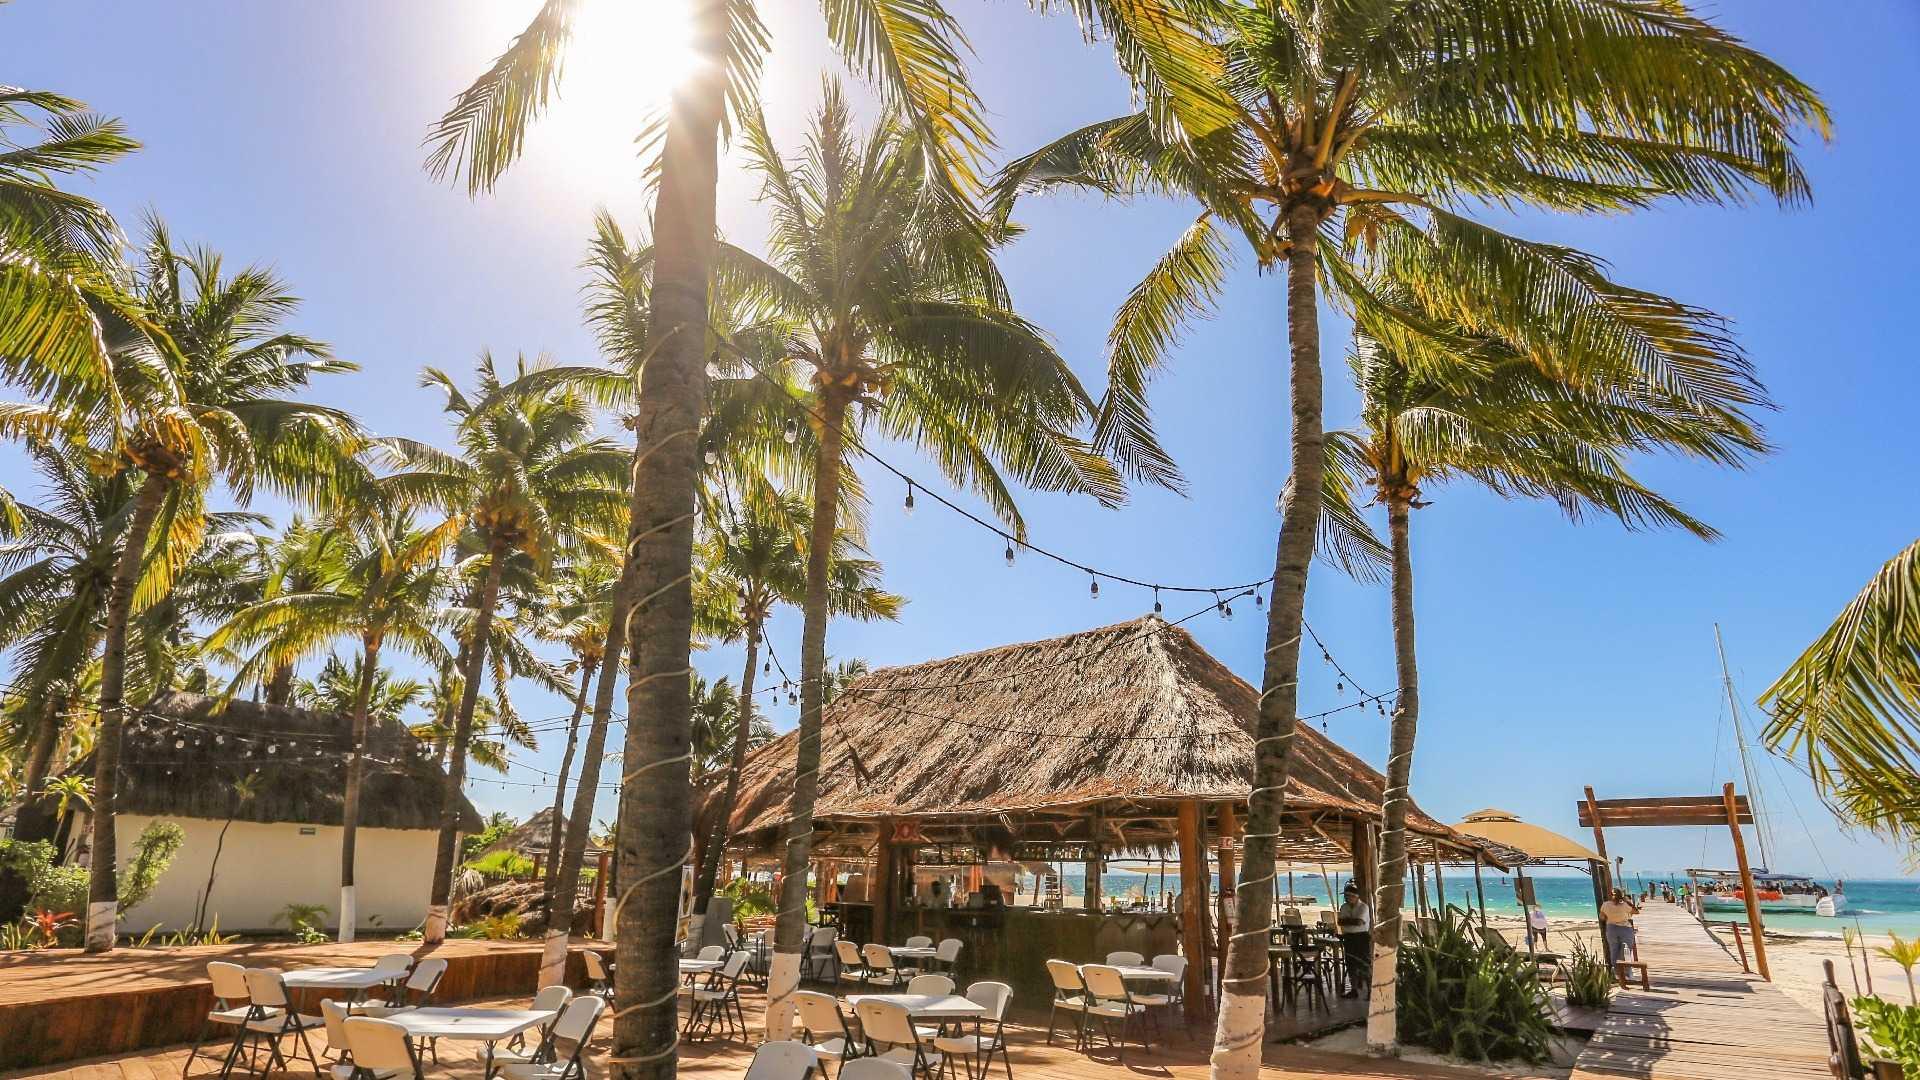 06 - Lowres - Club de playa Punta Blanca - Isla Mujeres